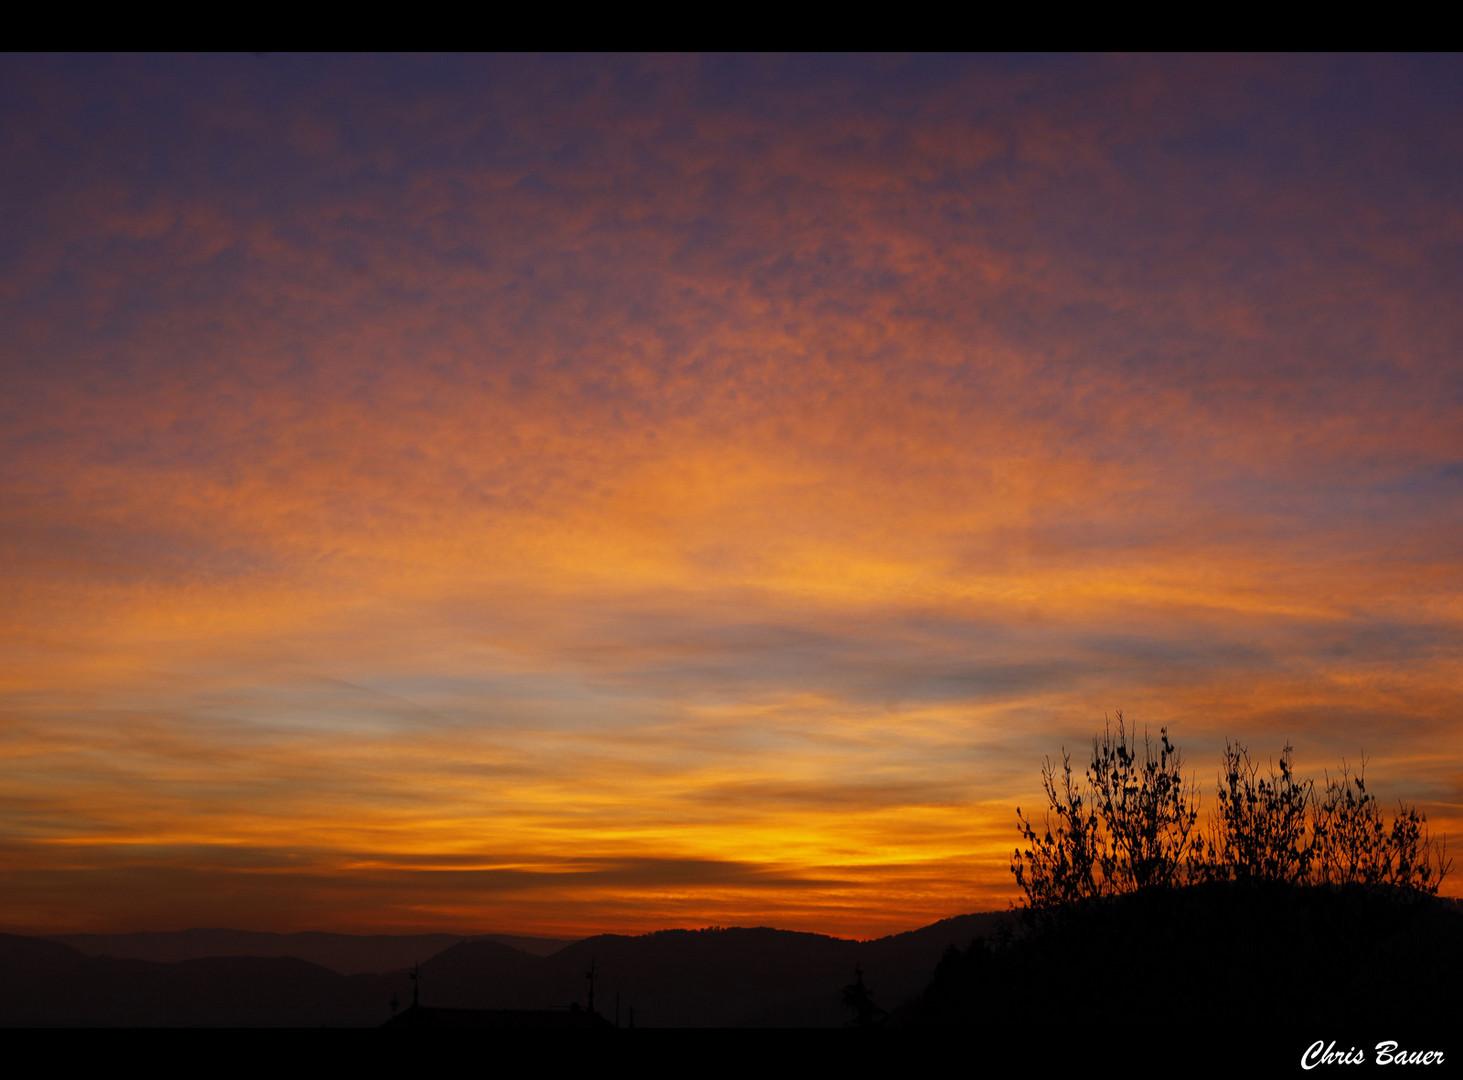 Wer immer am Horizont lebt, kennt keinen Sonnenuntergang.